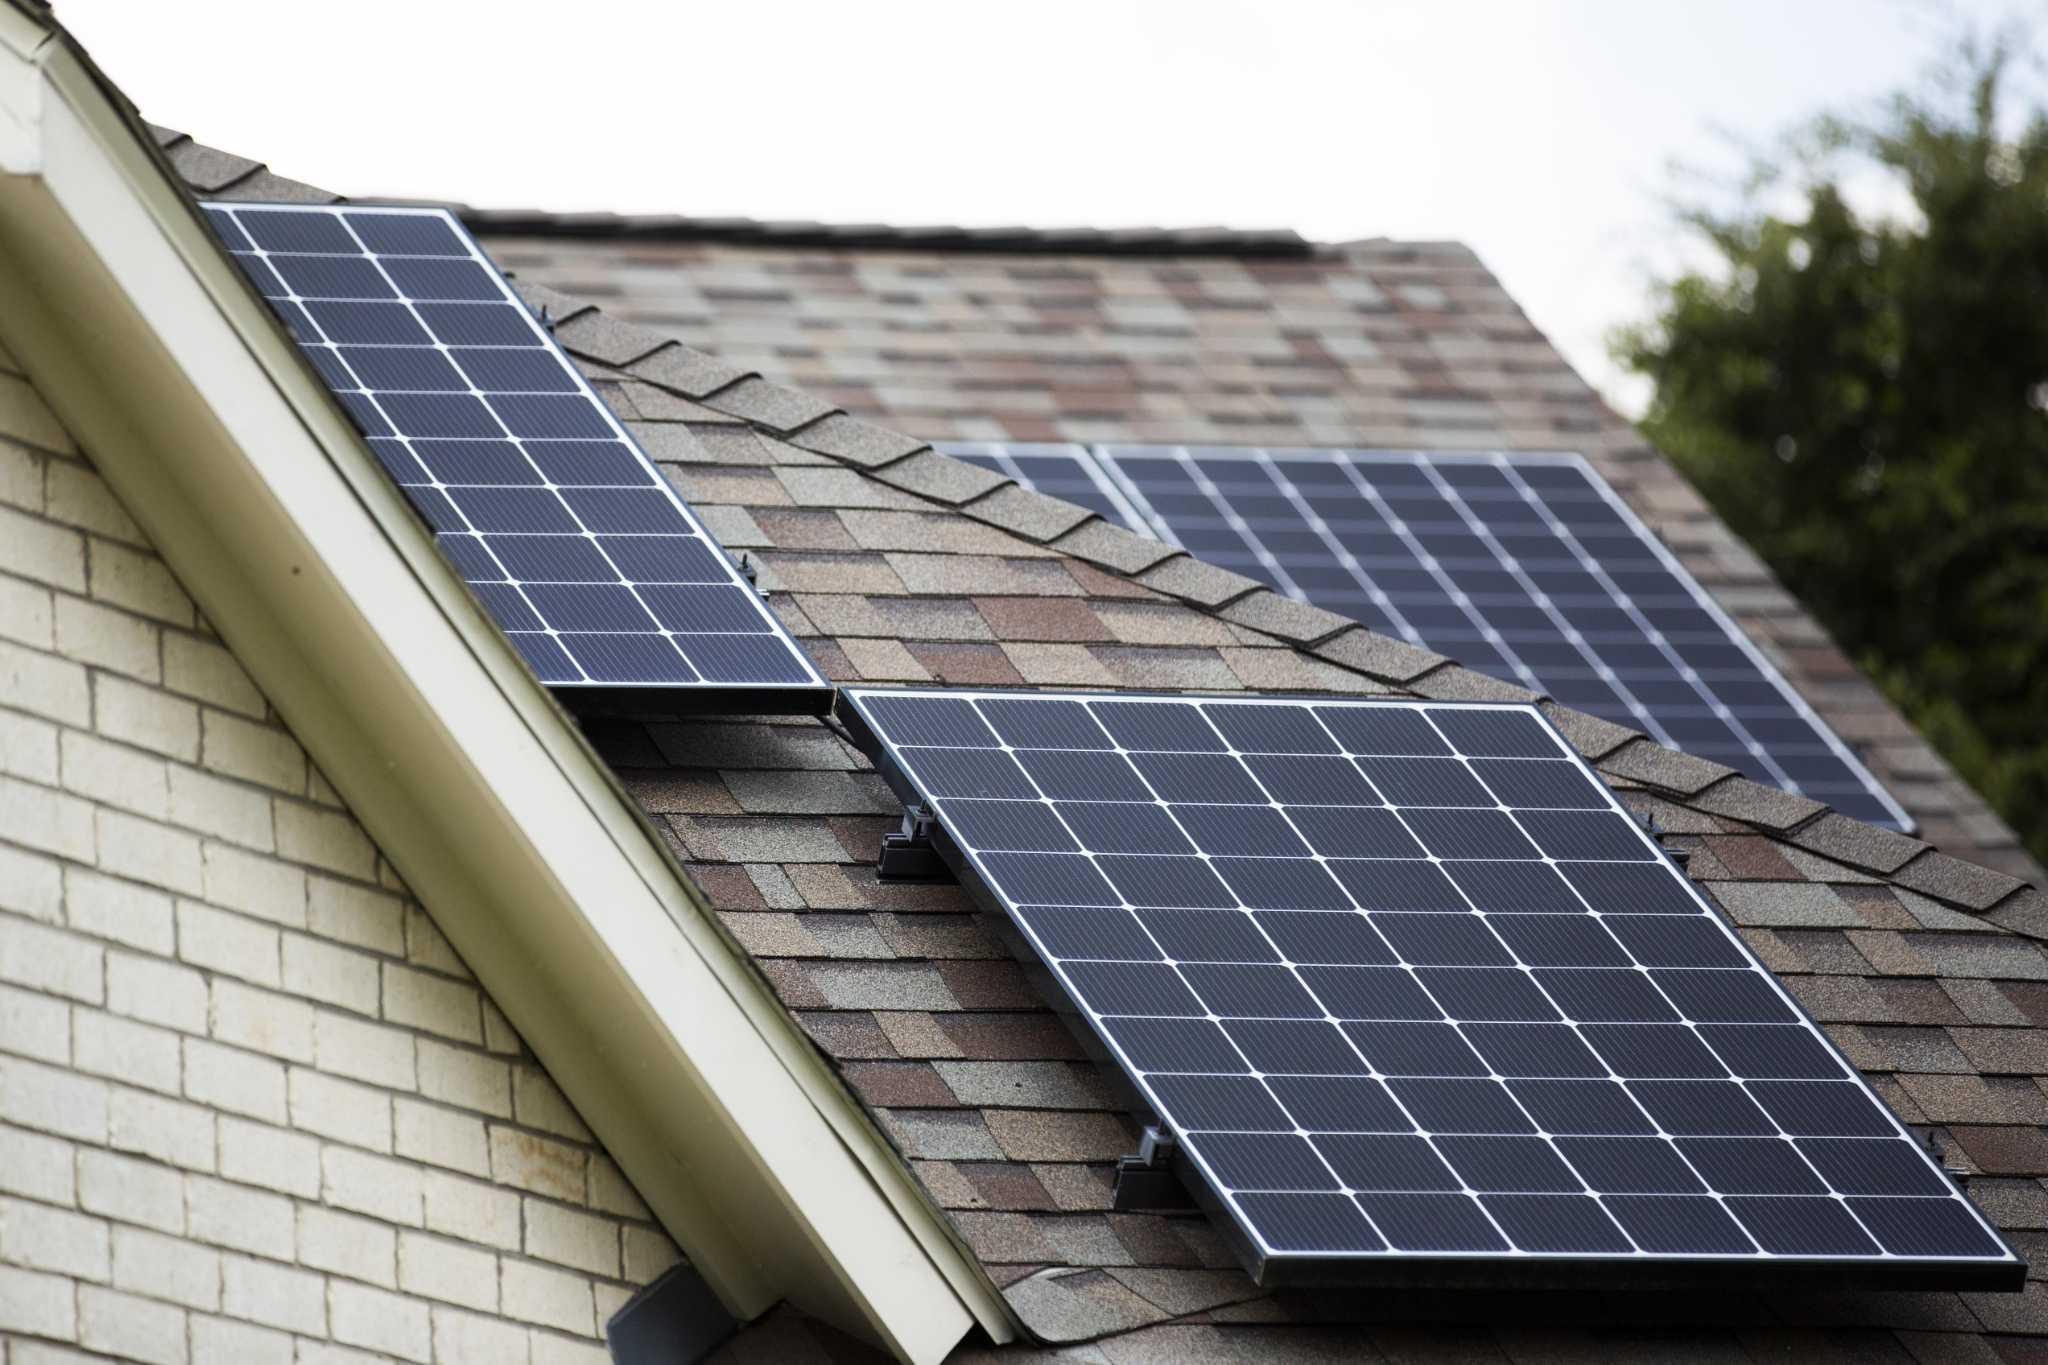 Texas faces labor shortage of solar installers